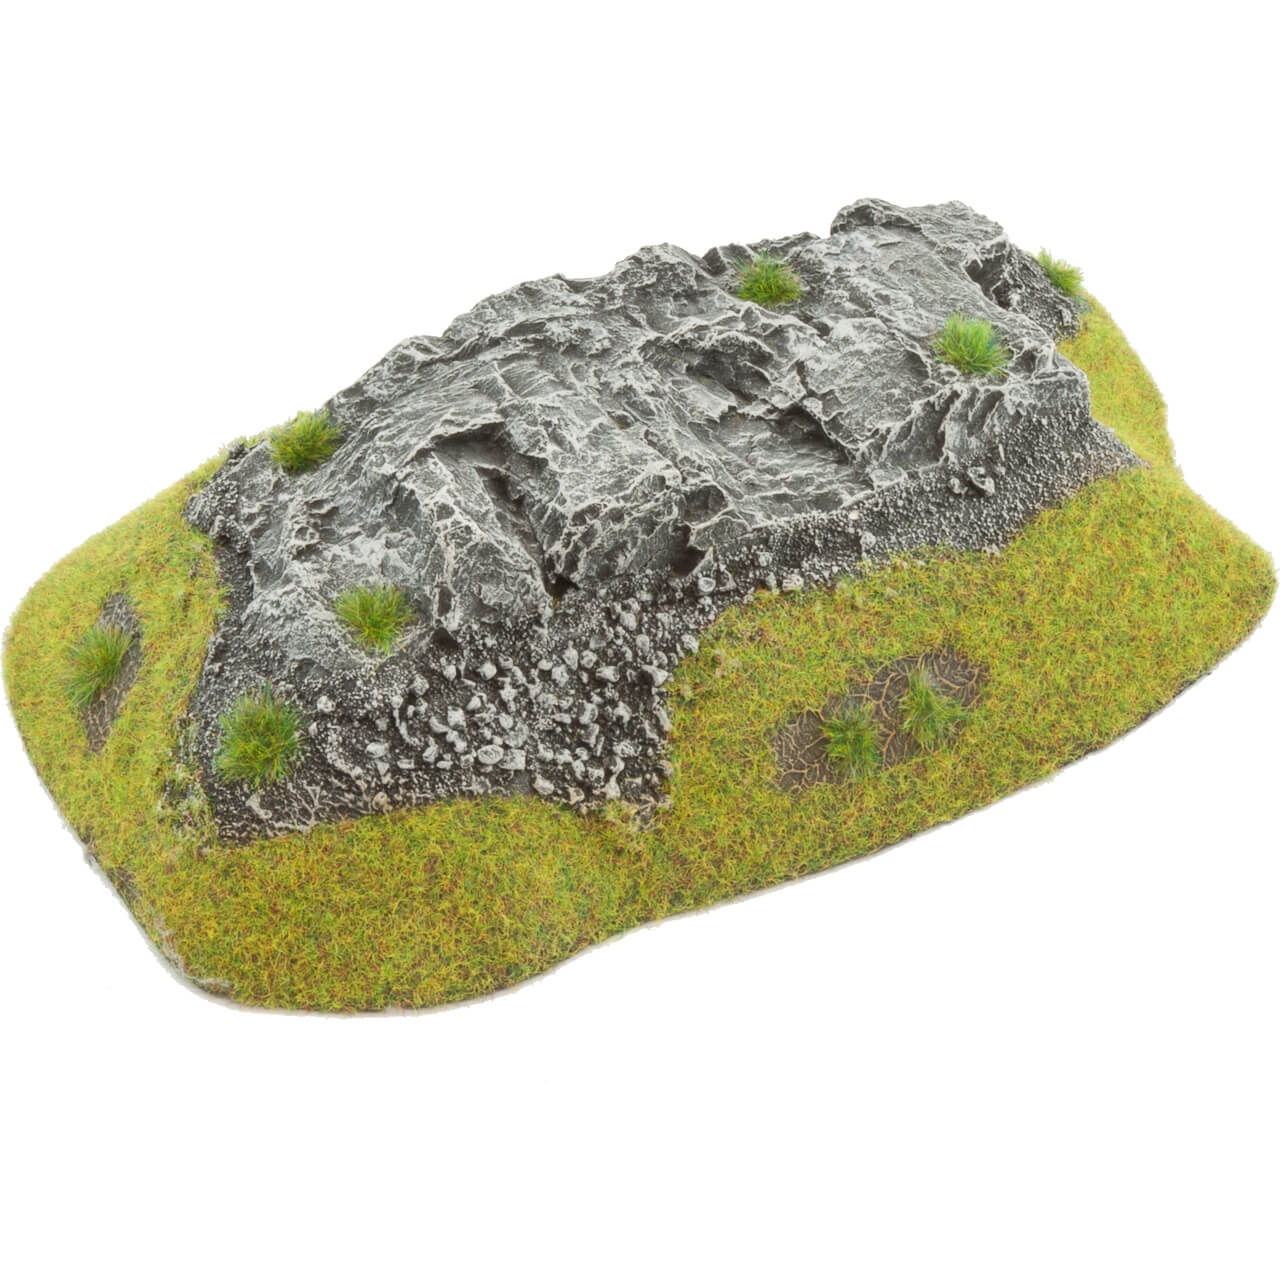 1. Produktabbildung - Felsenhügel 1